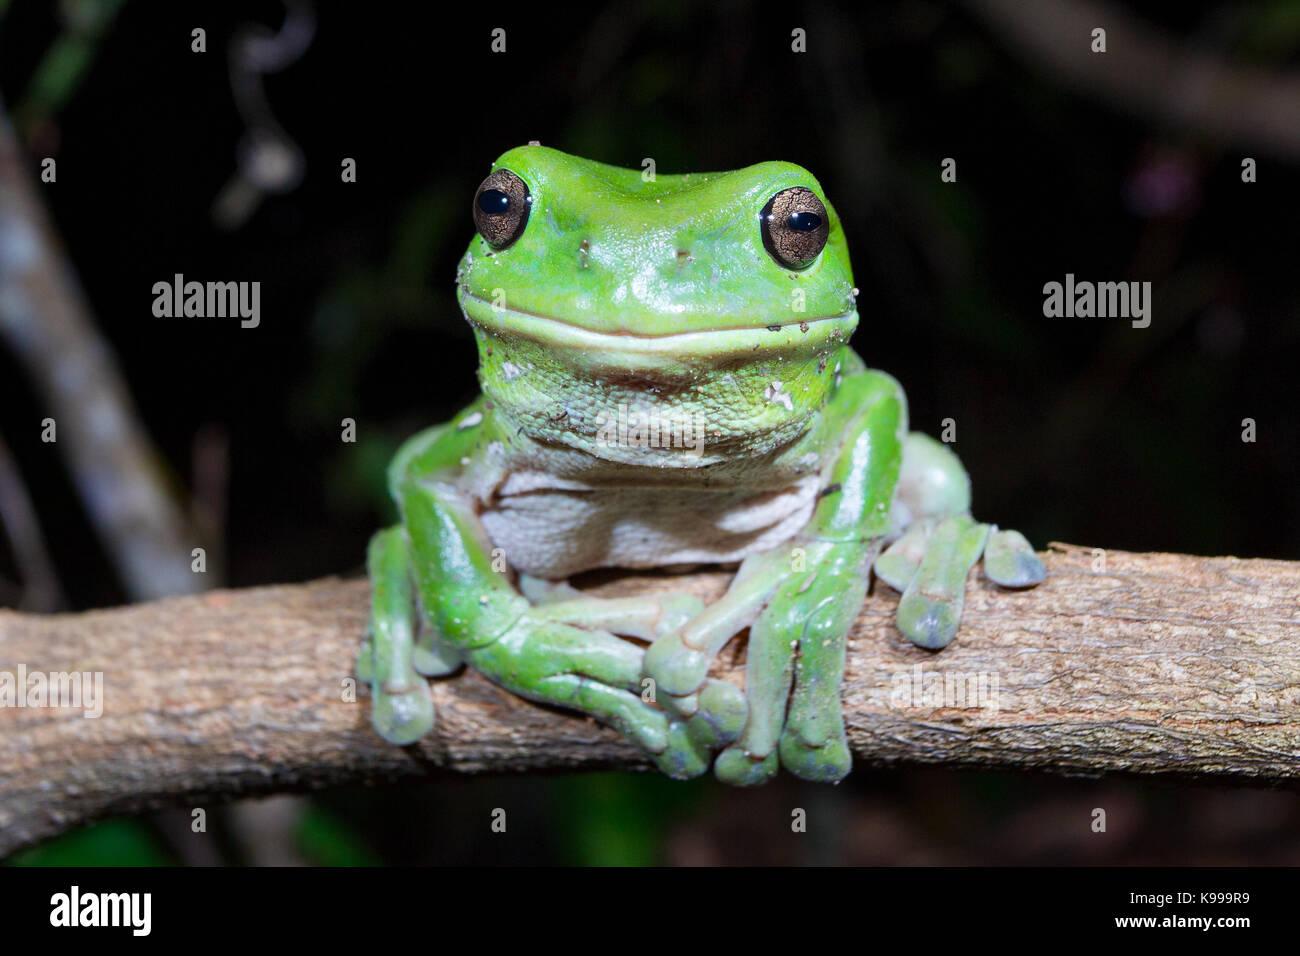 Australian Green Tree Frog (Litoria caerulea), Yuraygir National Park, NSW, Australia - Stock Image